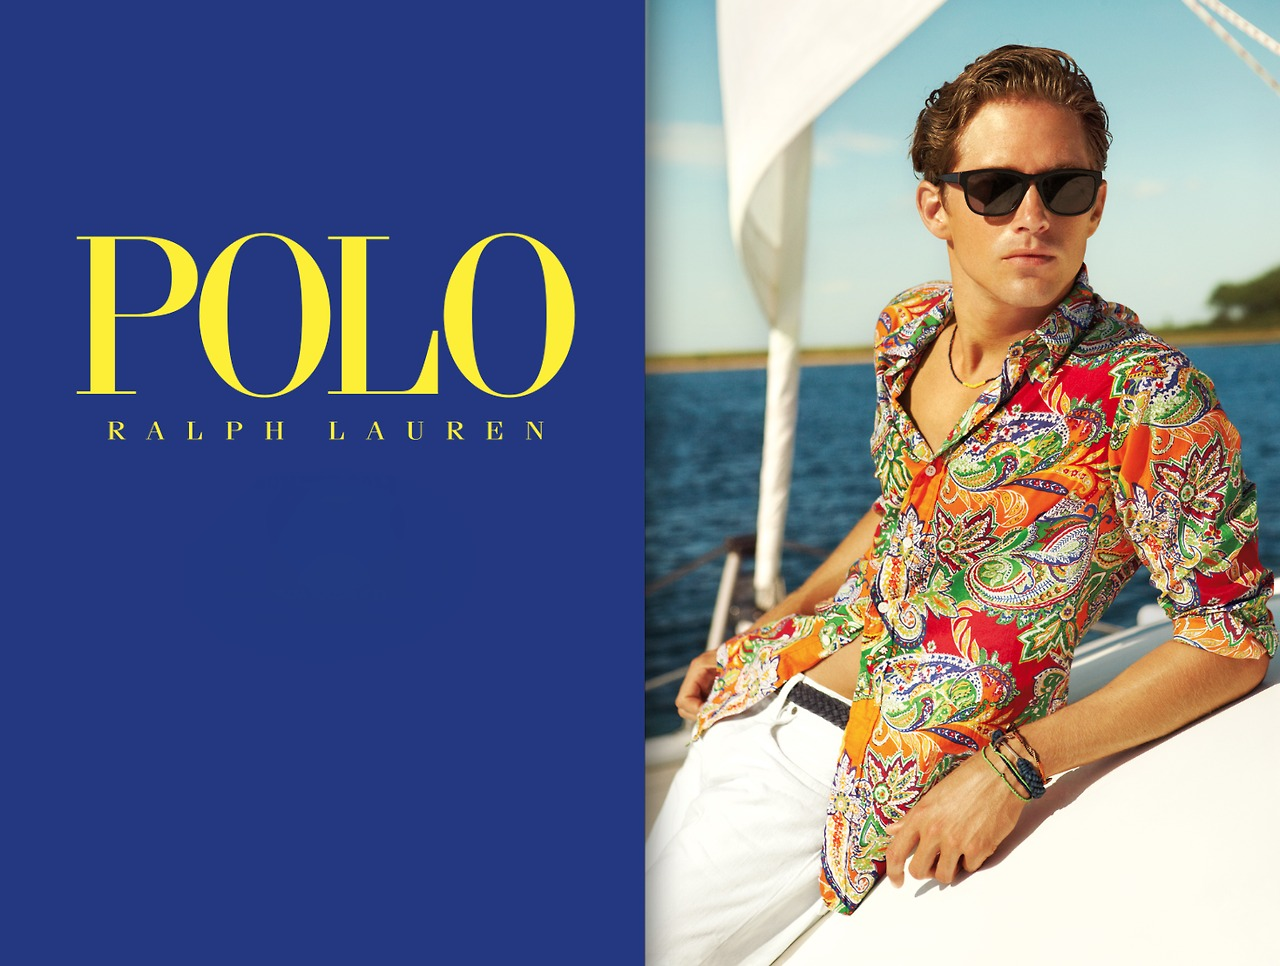 Travis Davenport & Kahari Mays Front Polo Ralph Lauren's Resort 2013 Campaign